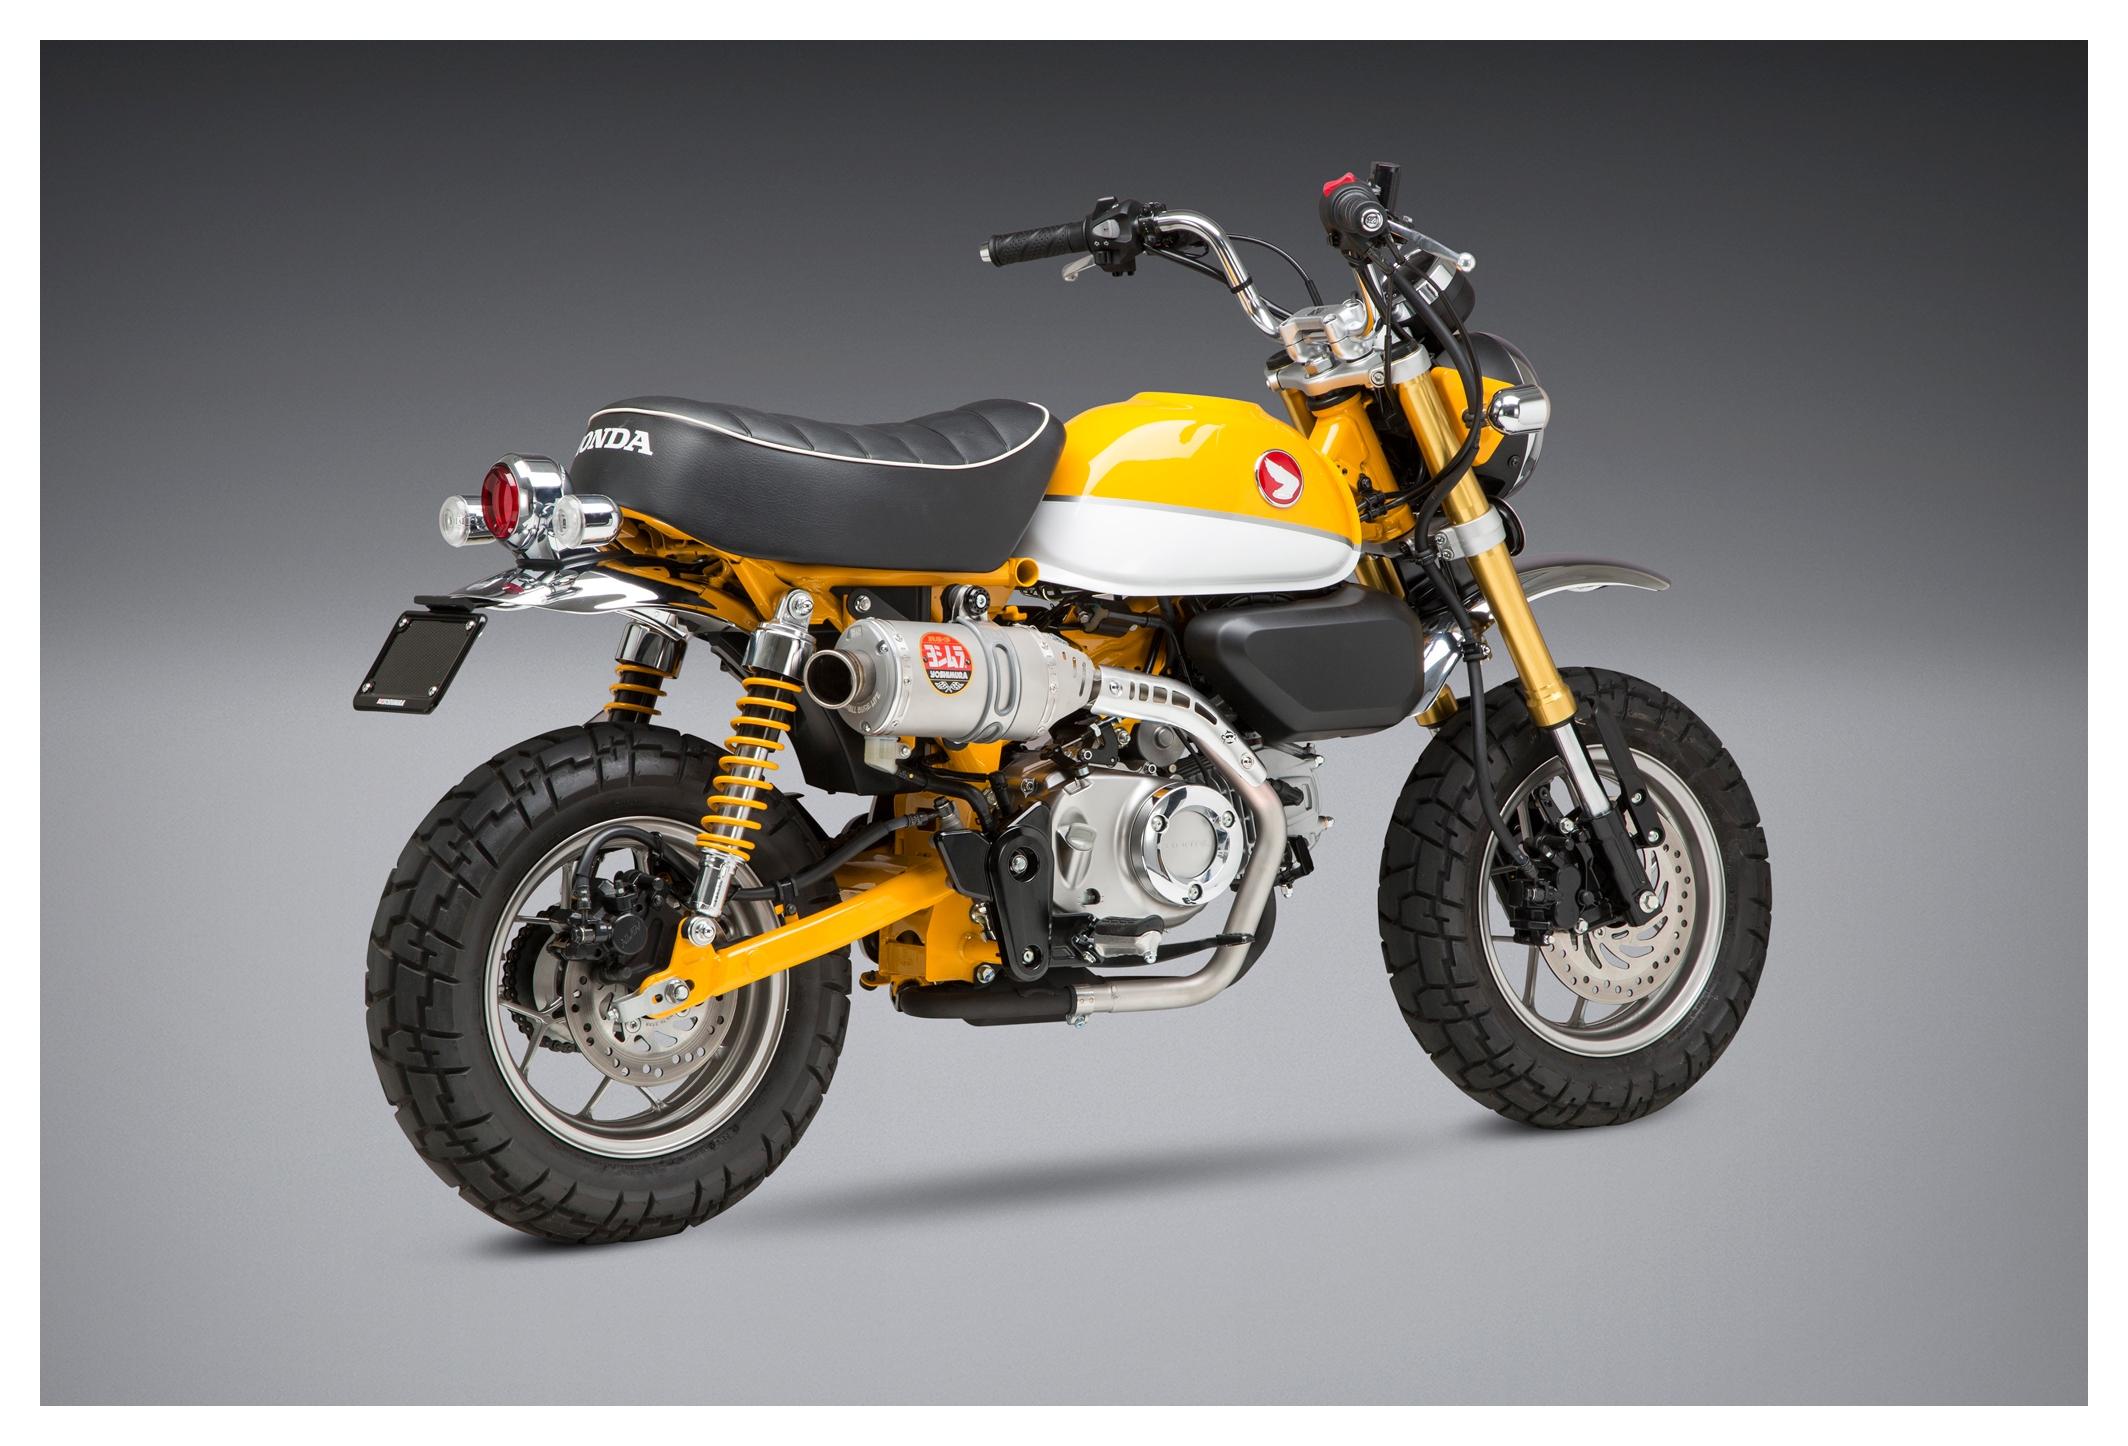 Yoshimura Rs 3 Works Race Exhaust System Honda Monkey 2019 5 30 53 Off